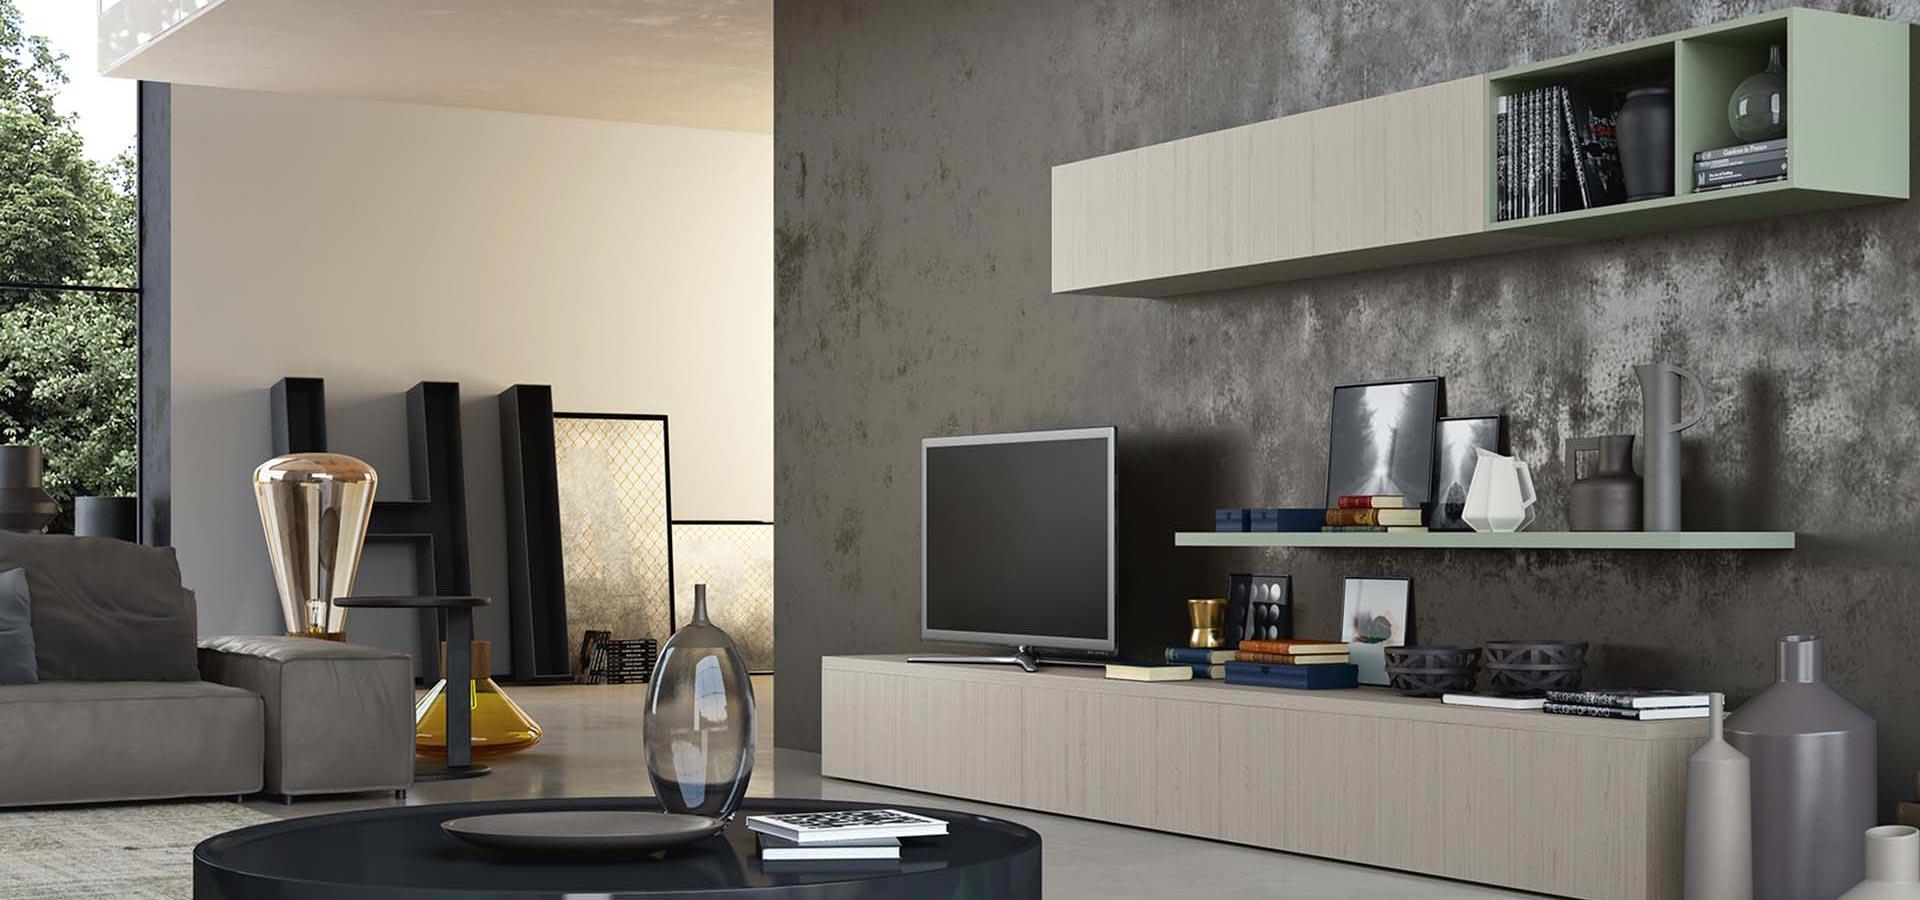 Wega setting 14 meroni arreda for Soggiorni living moderni